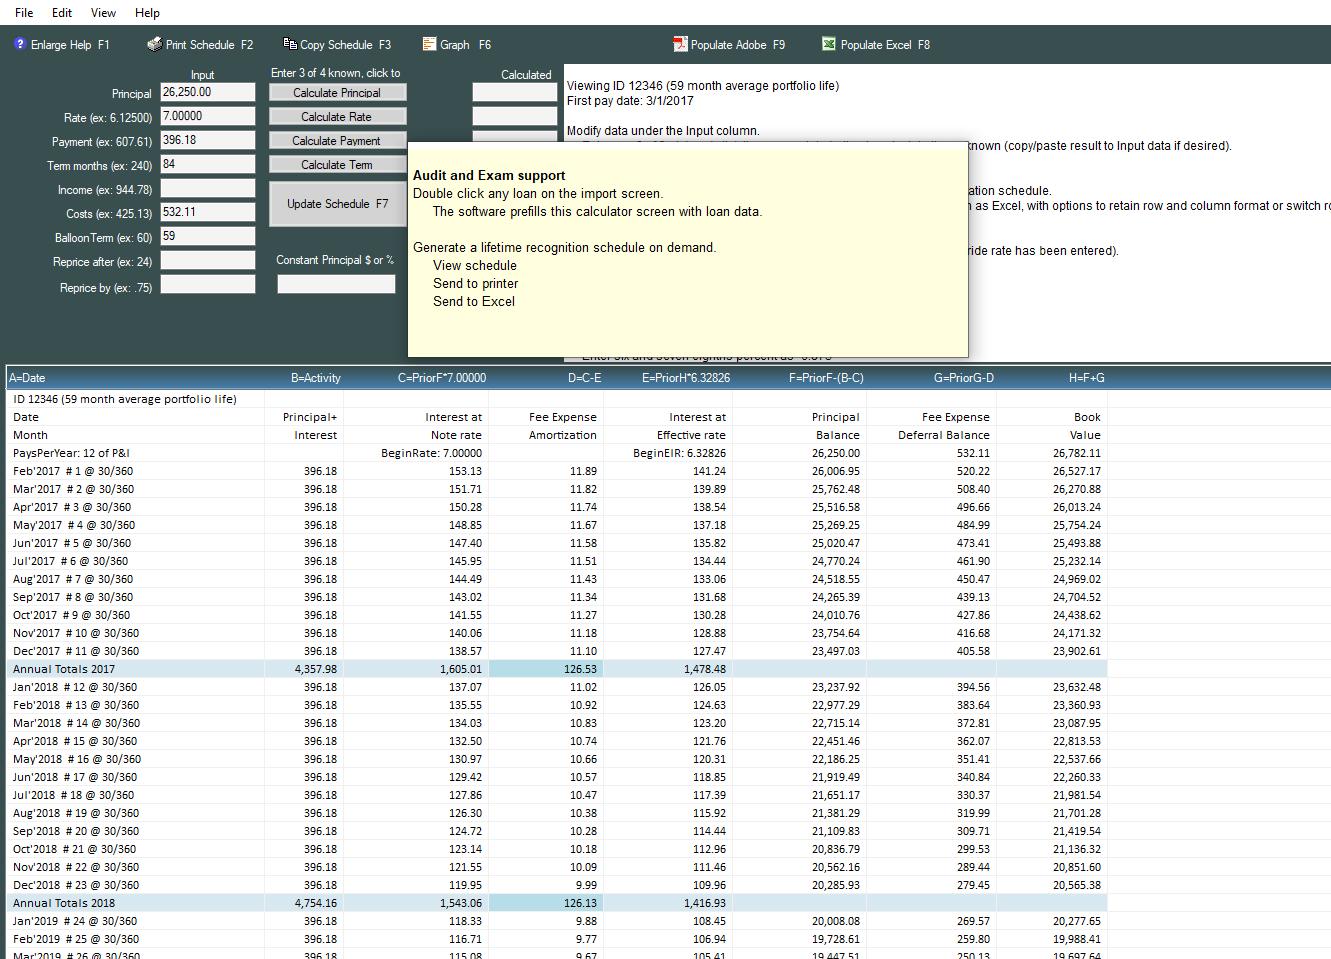 fasb 91 dealer fees amortization software